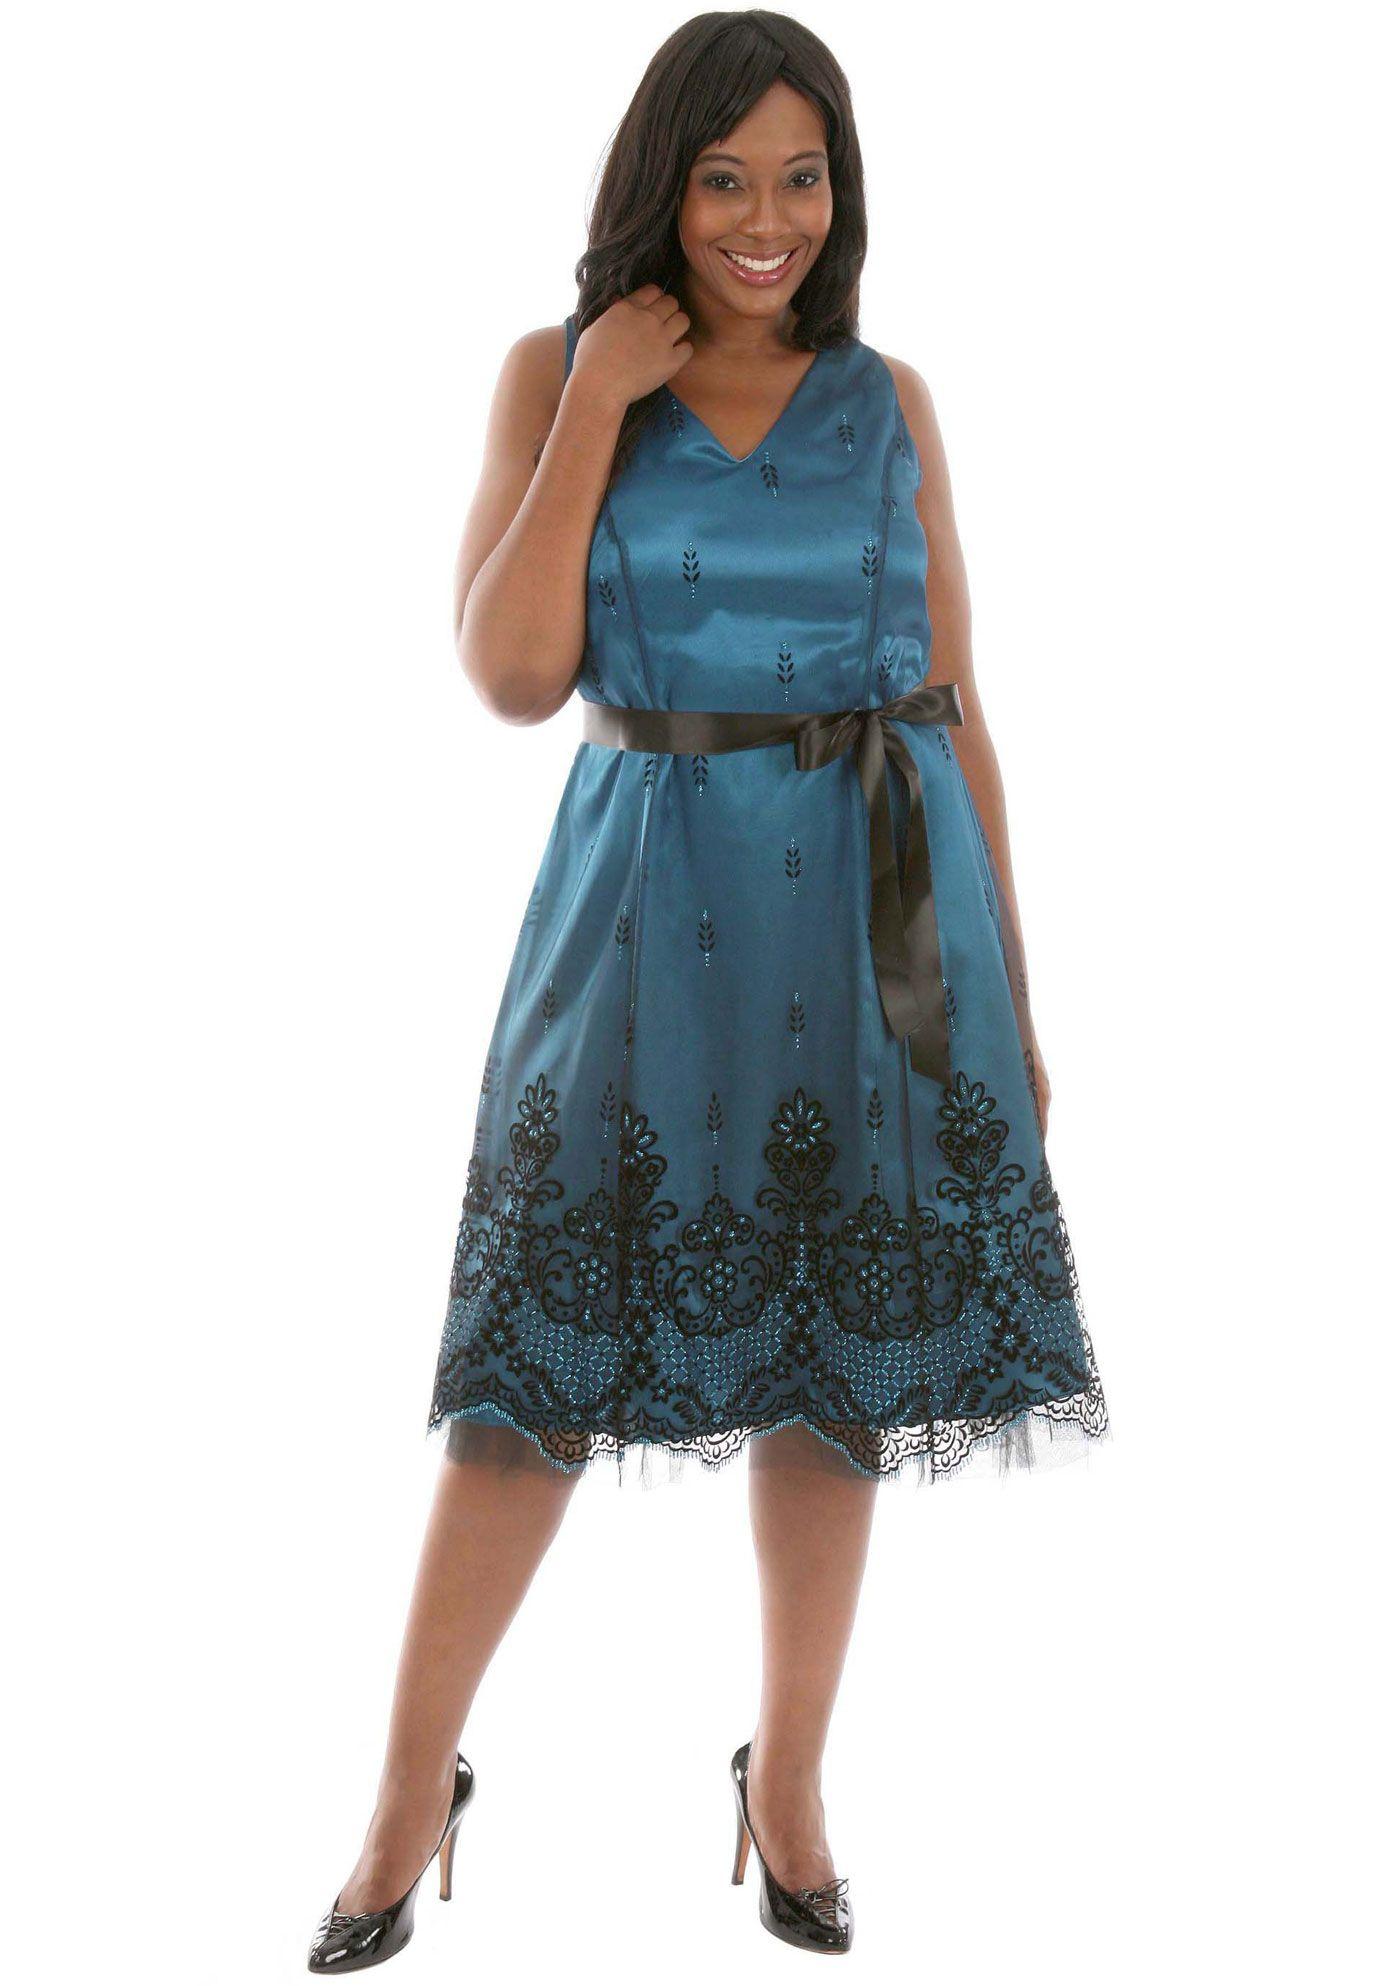 Elyvo Rochii de seara xxl si costume de ocazie elegante Fii unica intr-o rochie eleganta fabricata in Romania de Elyvo Brokart! Va oferim o gama larga de R ochii de Seara lungi si C ostume de Ocazie midi create special pentru marimi mari xxl si pentru evenimentele deosebite din viata dumneavoastra.